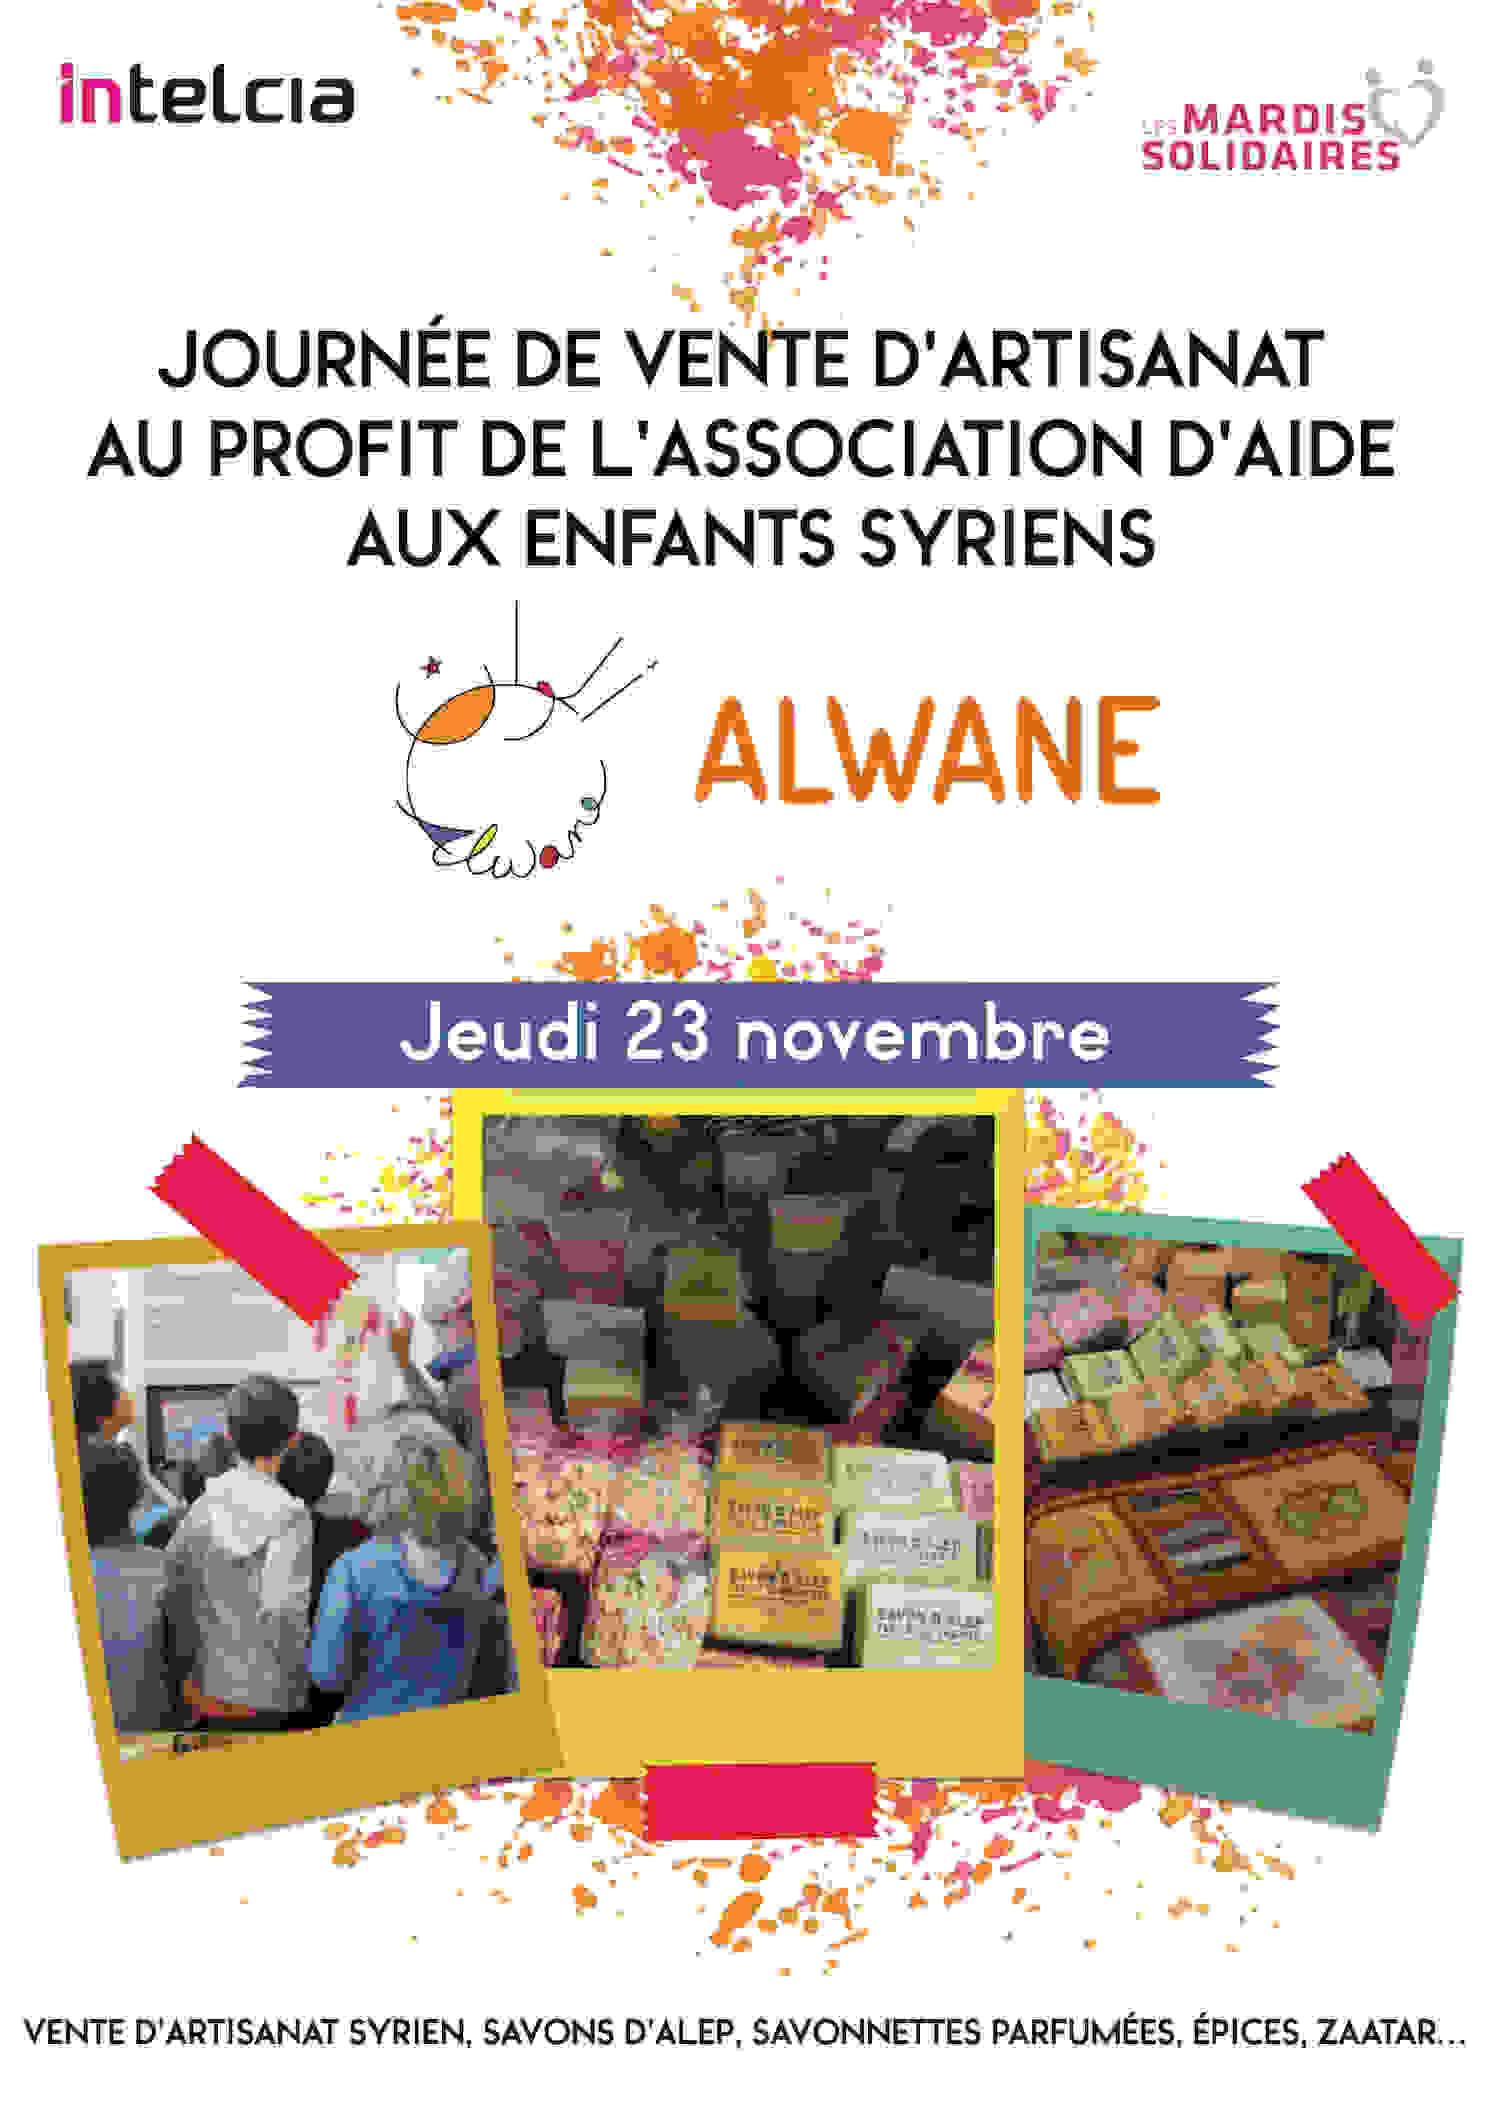 Vente d'artisanat syrien à Intelcia